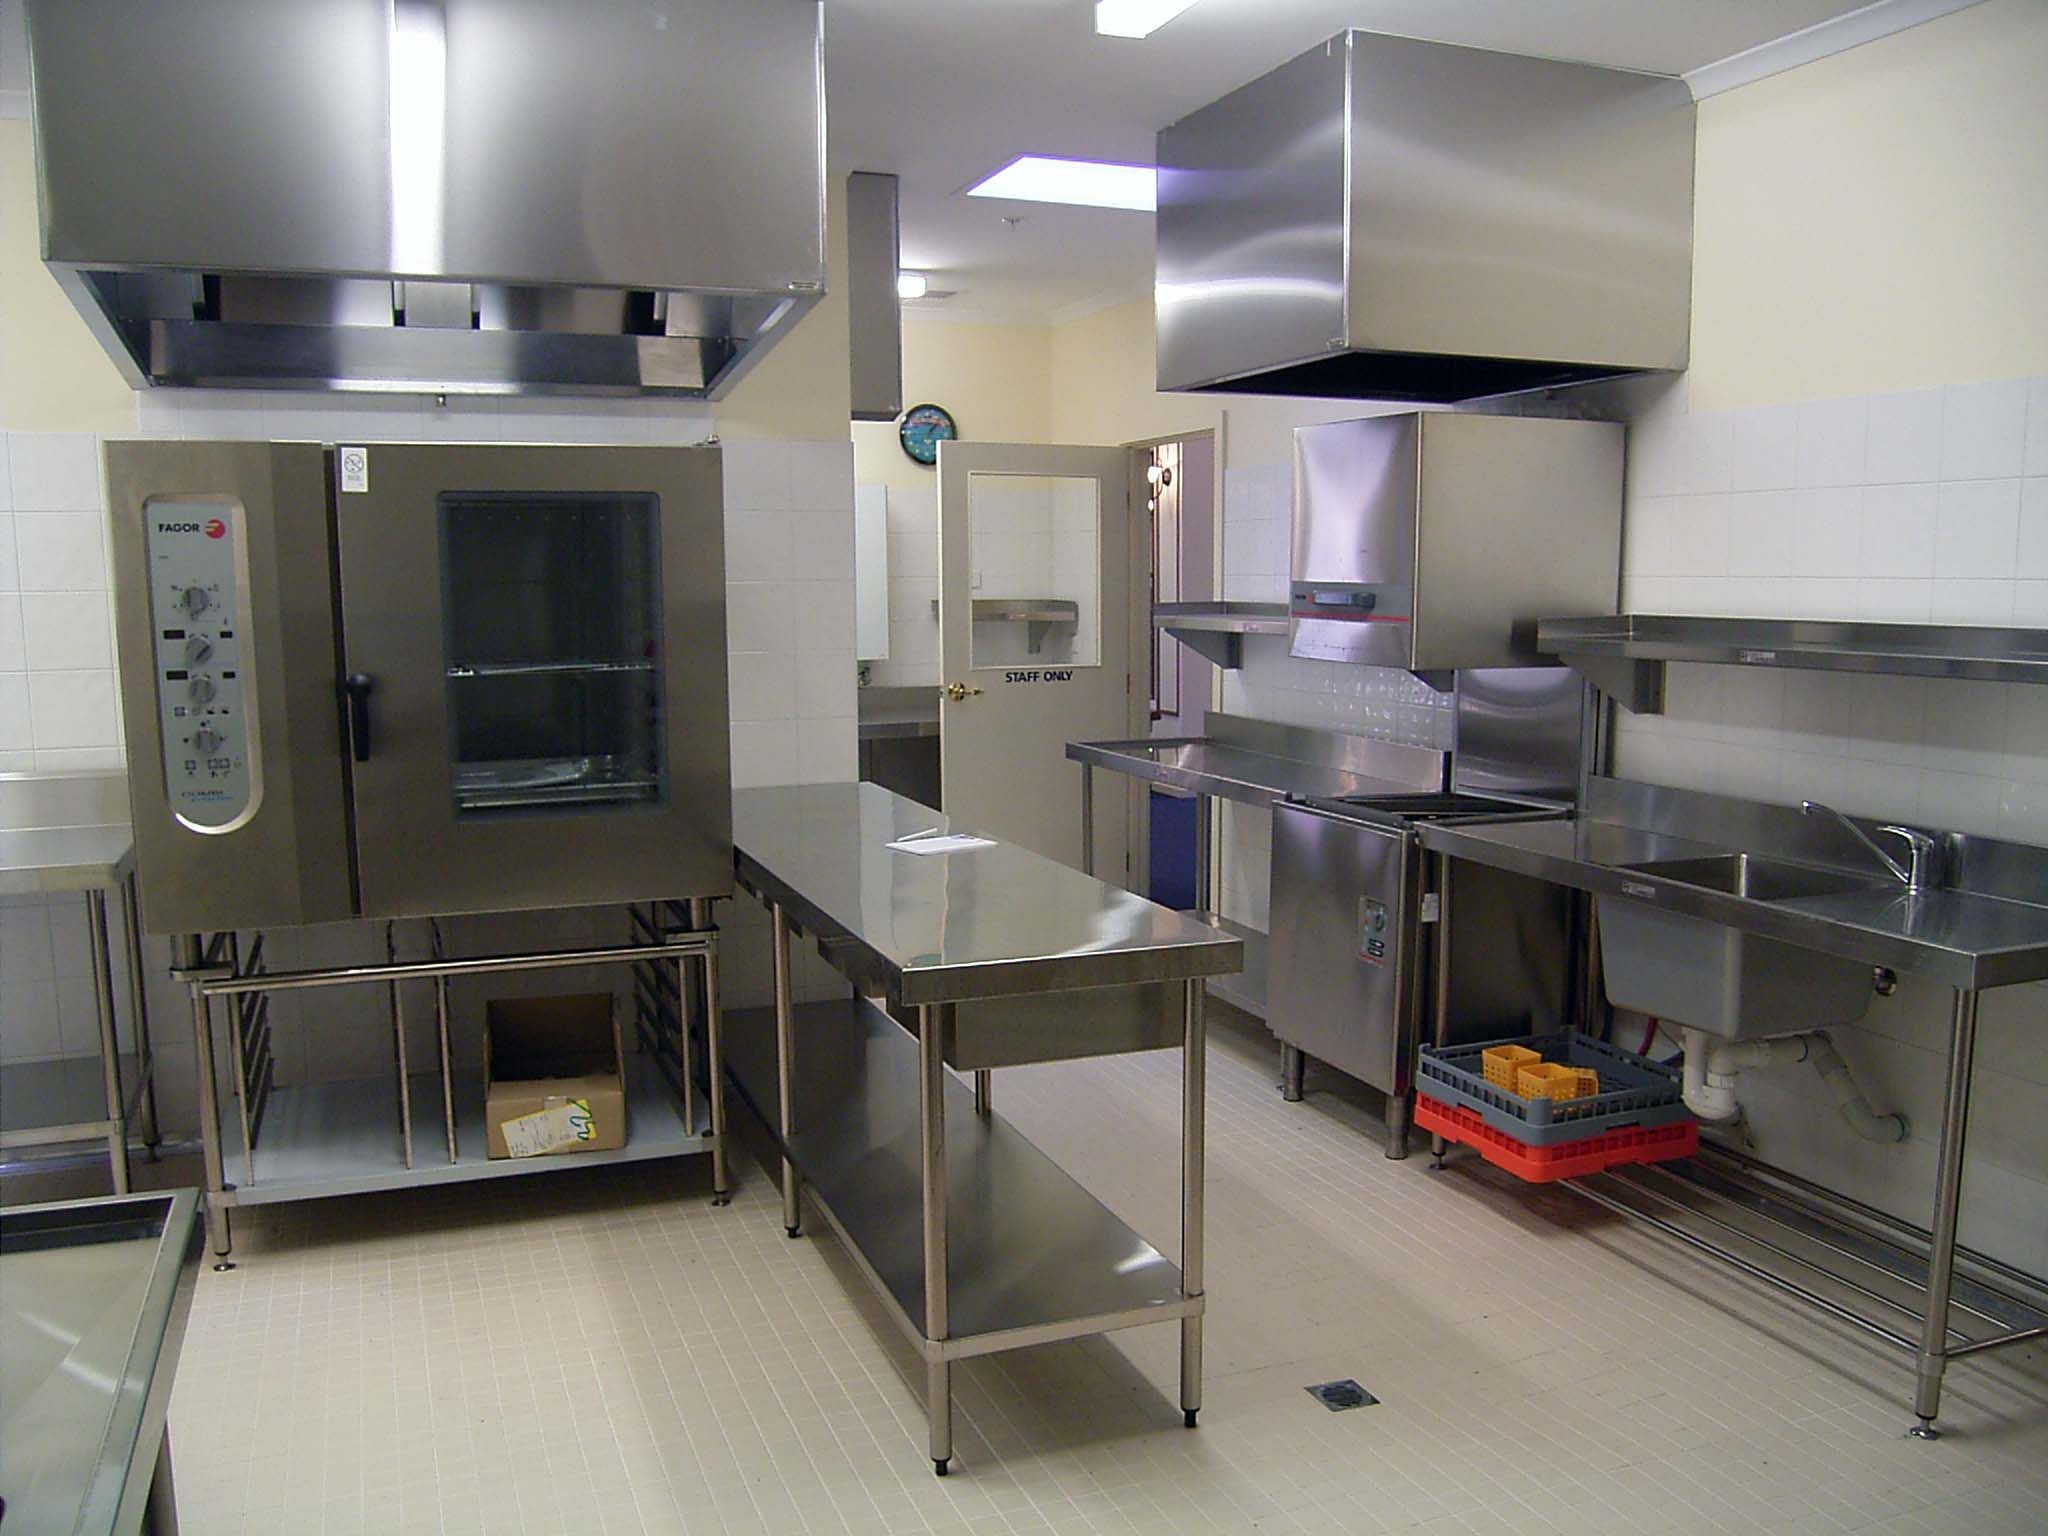 Restaurant kitchen design  About Commercial Kitchen Design Source Google What began as